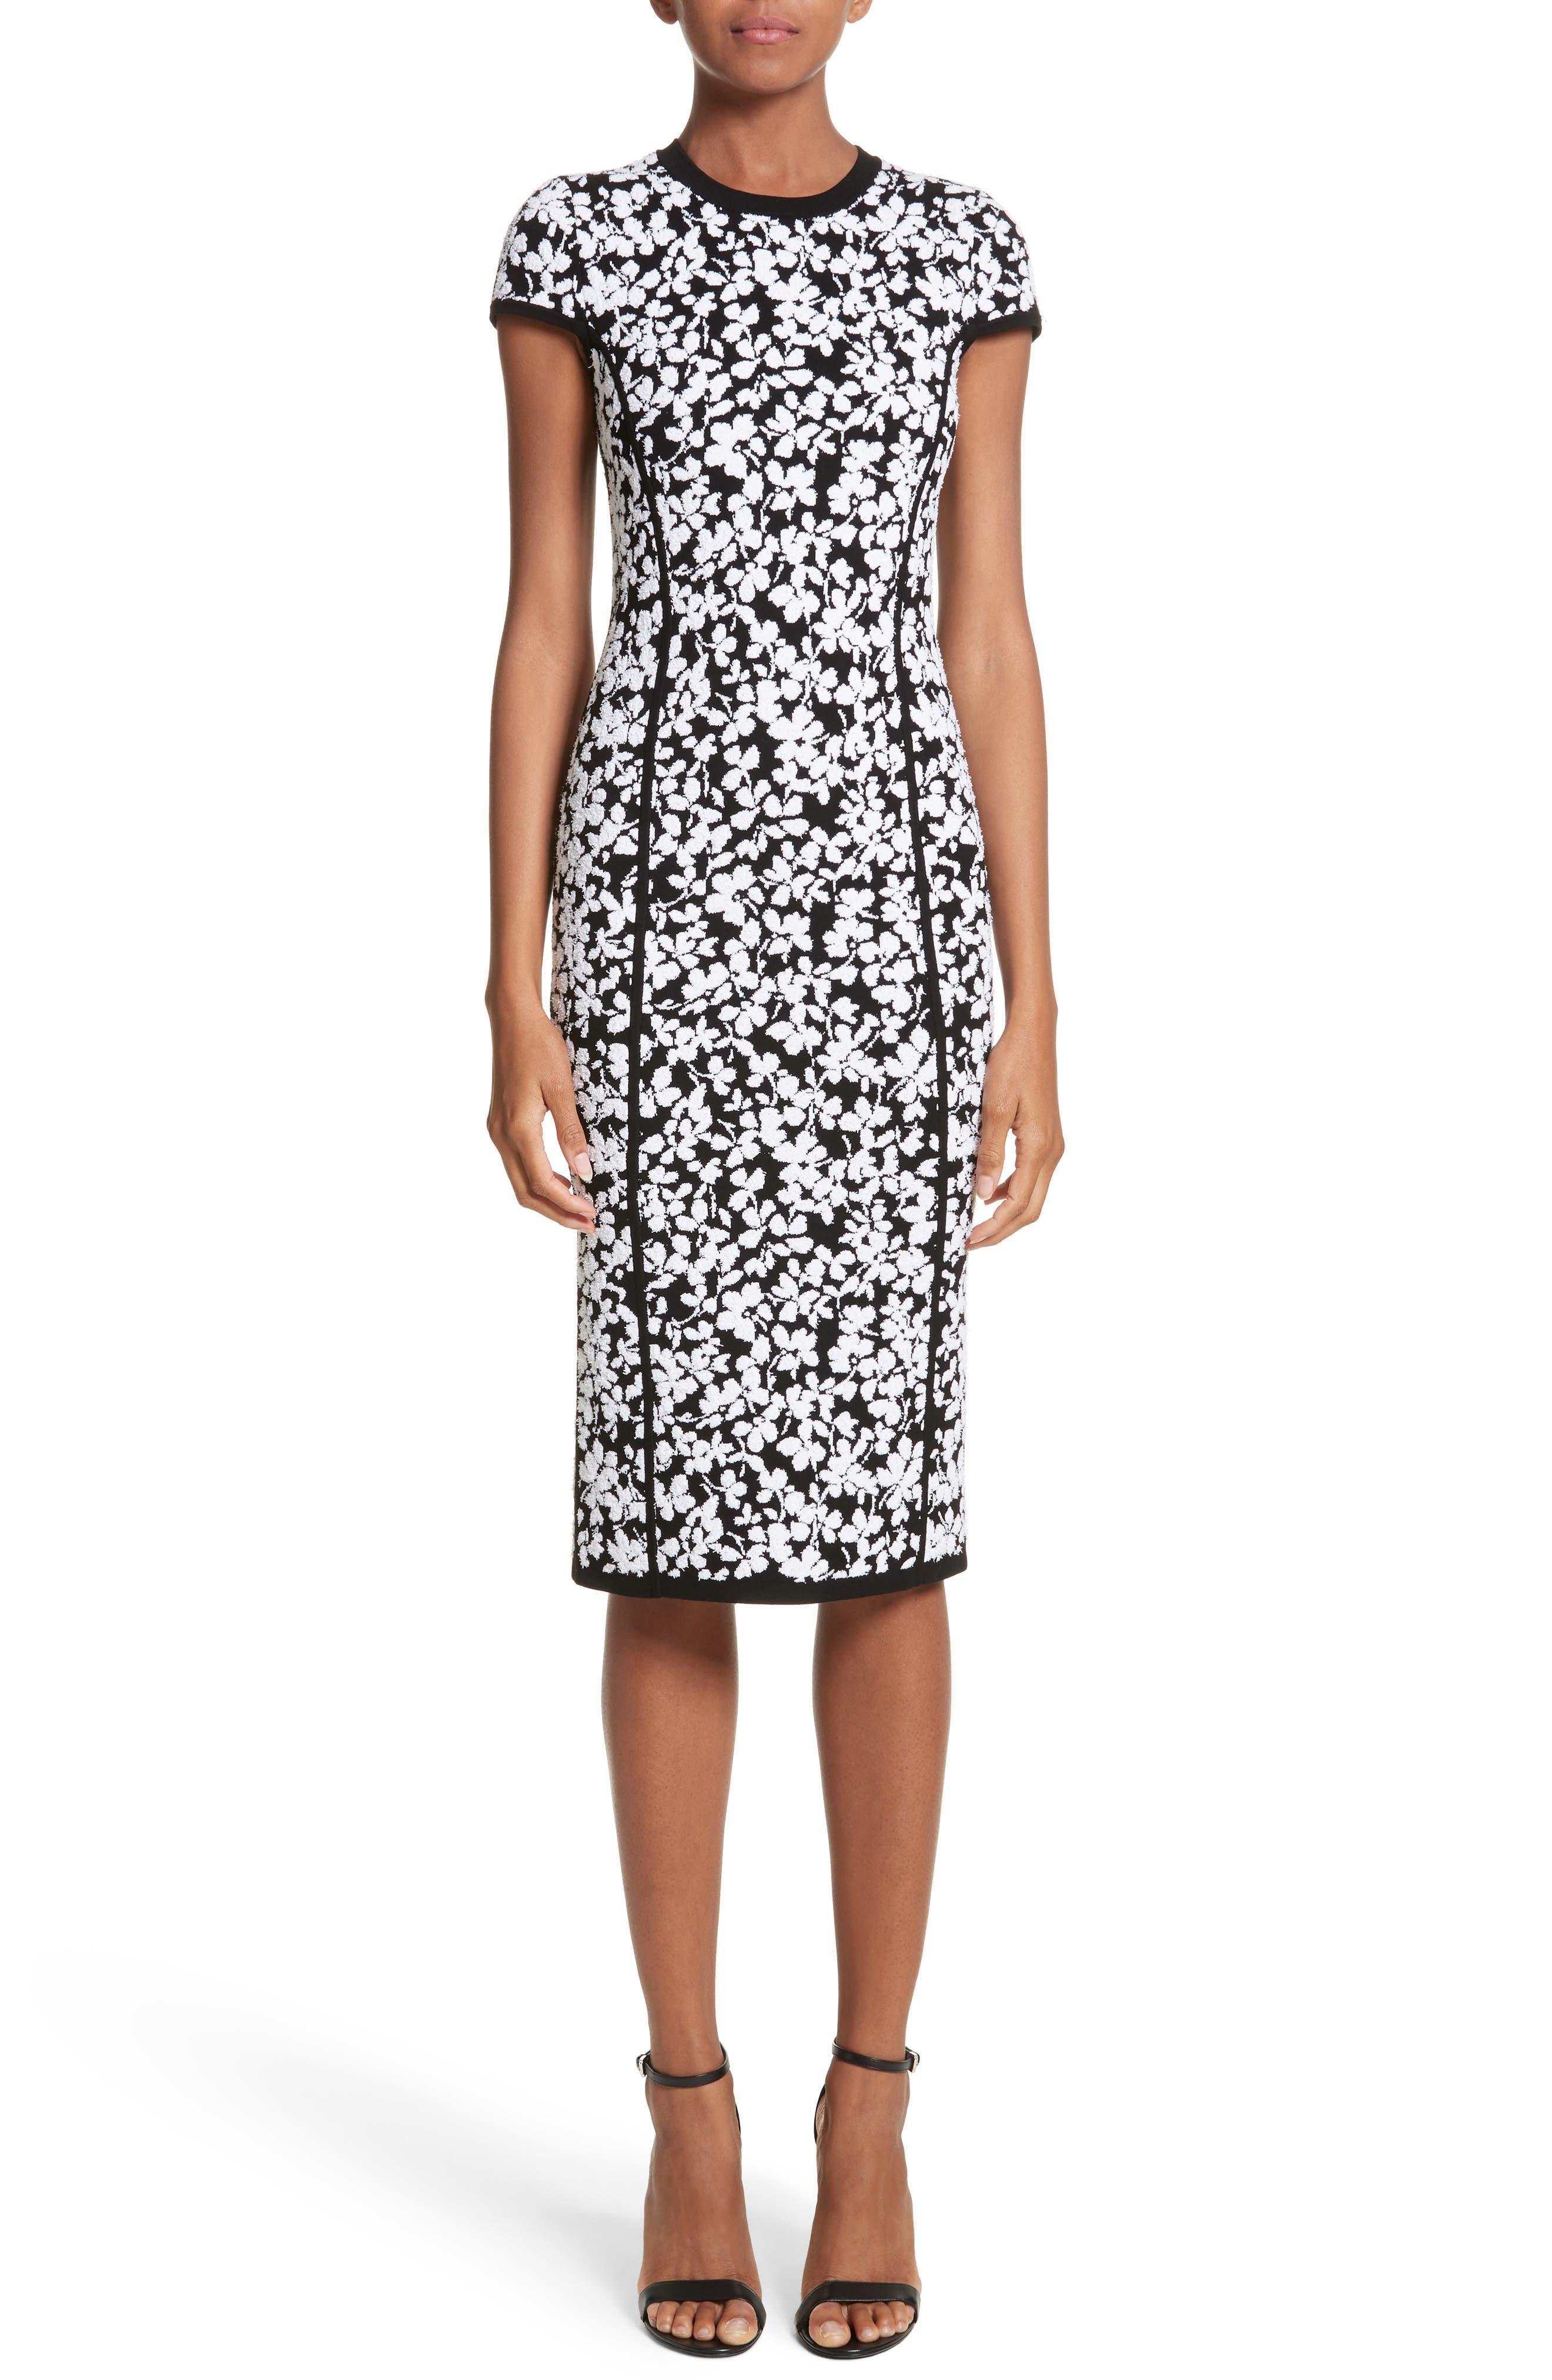 Alternate Image 1 Selected - Michael Kors Floral Jacquard Sheath Dress